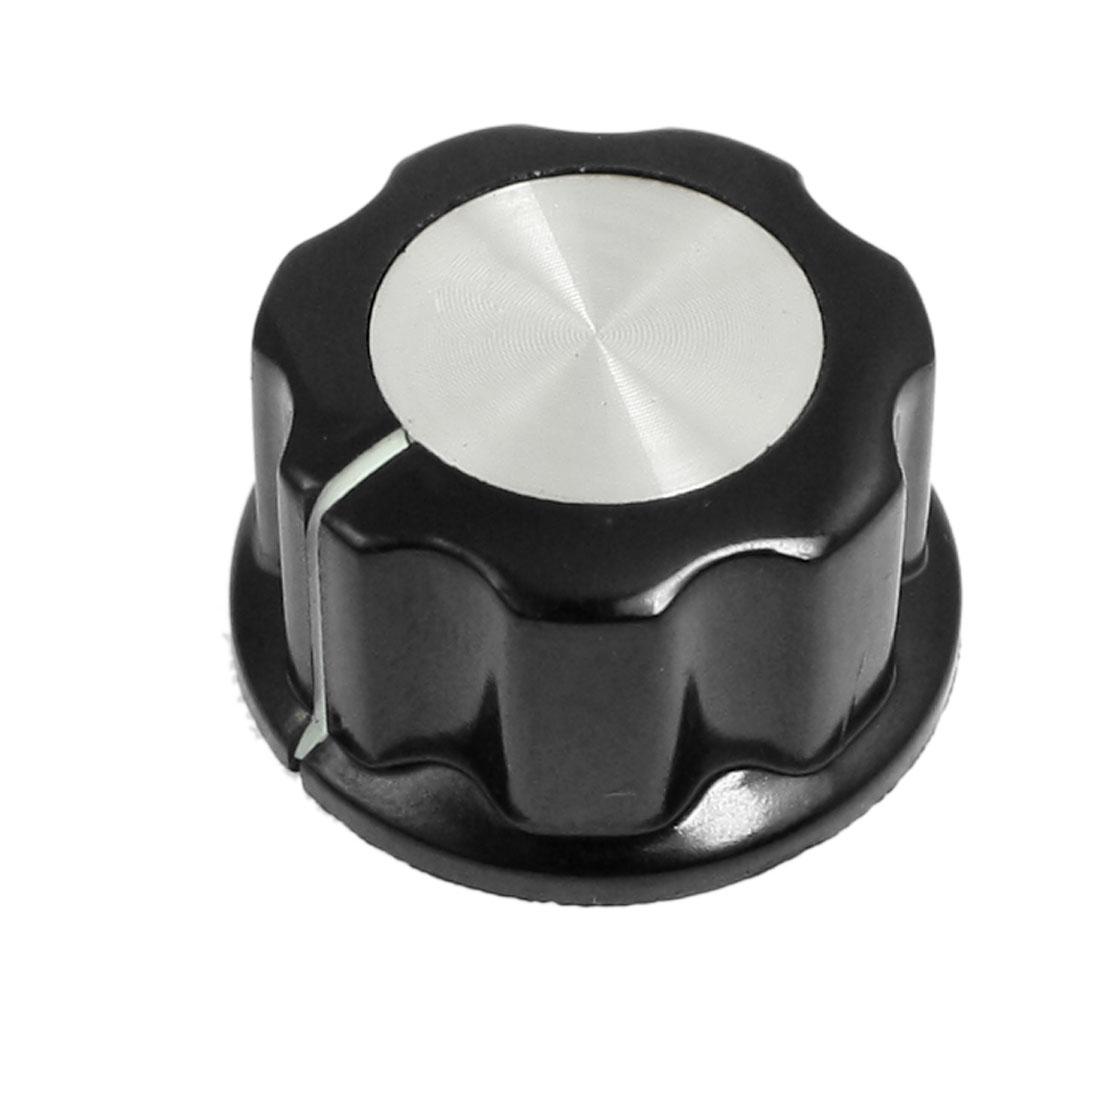 27mm x 15mm Potentiometer Control Volume Rotary Knob Cap Black Silver Tone